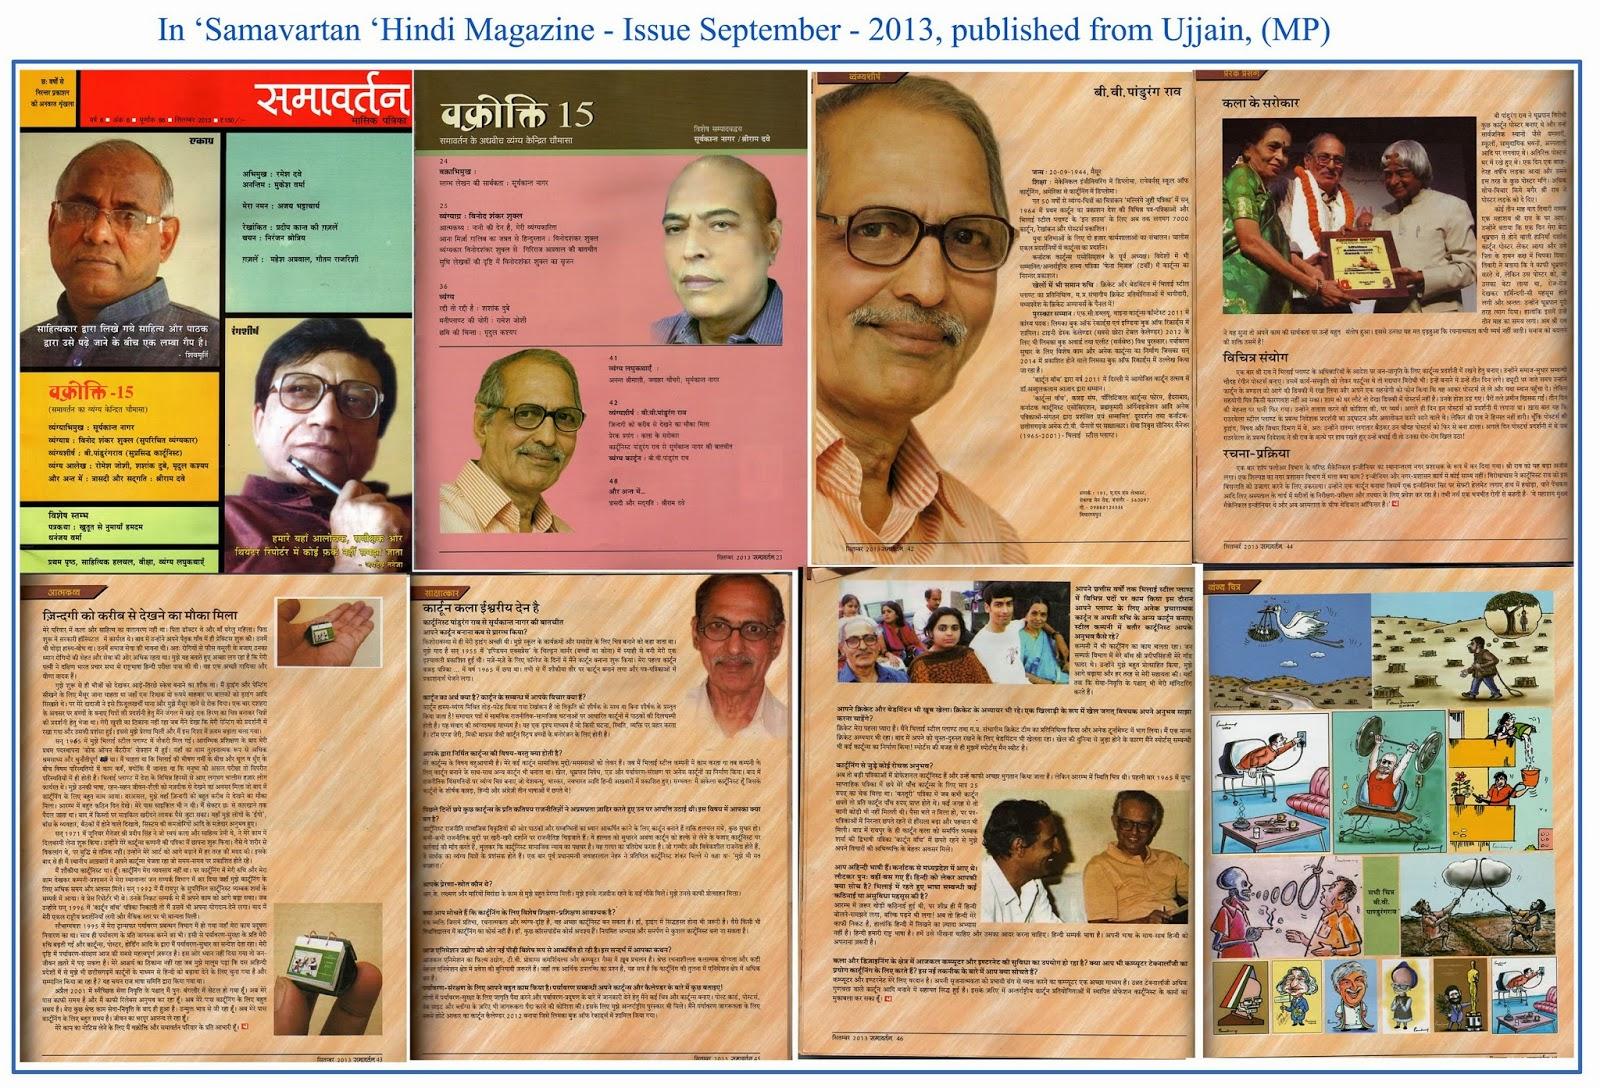 New Cartoons Clips Meena Ka School Cartoon HD Wallpaper